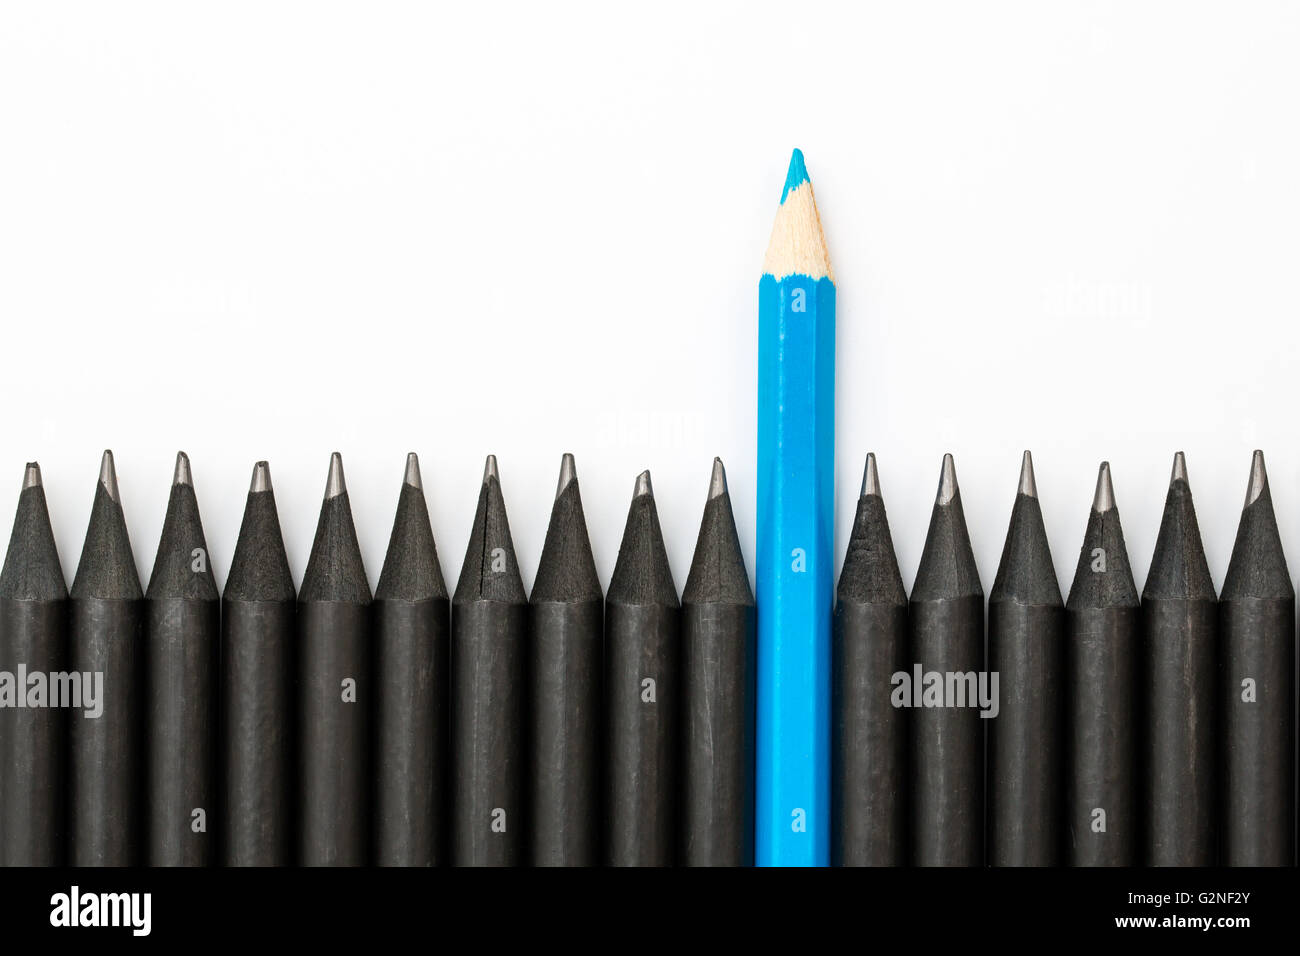 Crayon bleu se démarquer de la rangée de crayons noir. Photo Stock